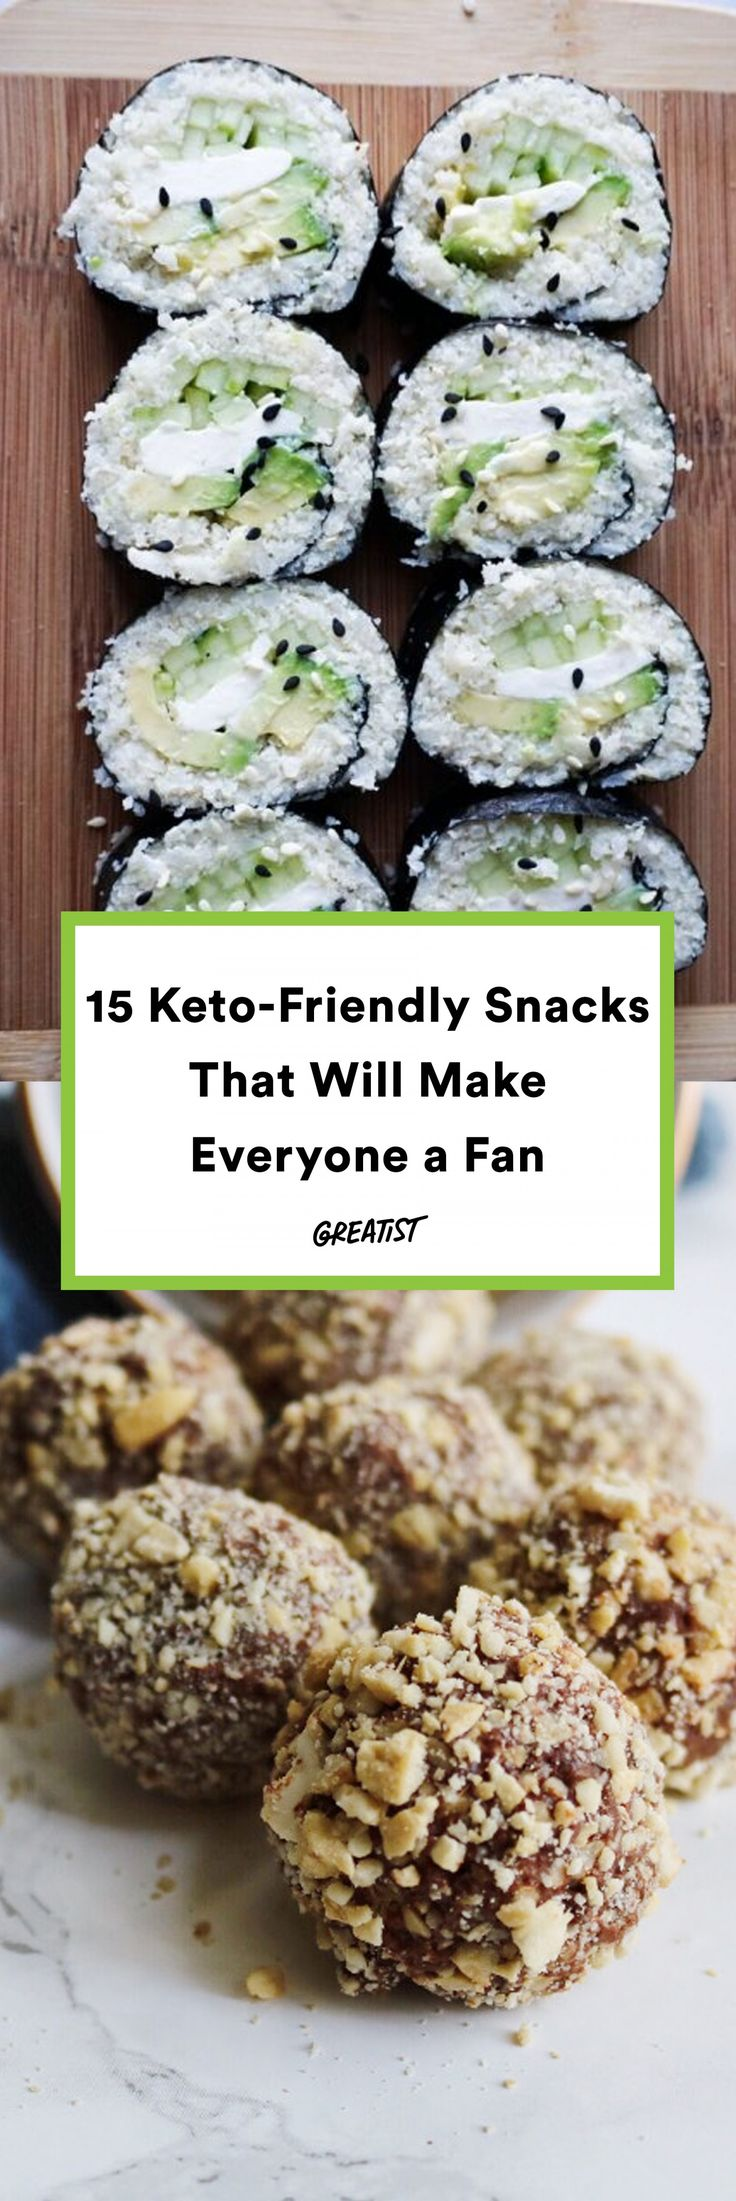 15 Keto Snacks That Take Care of Comfort Food Cravings